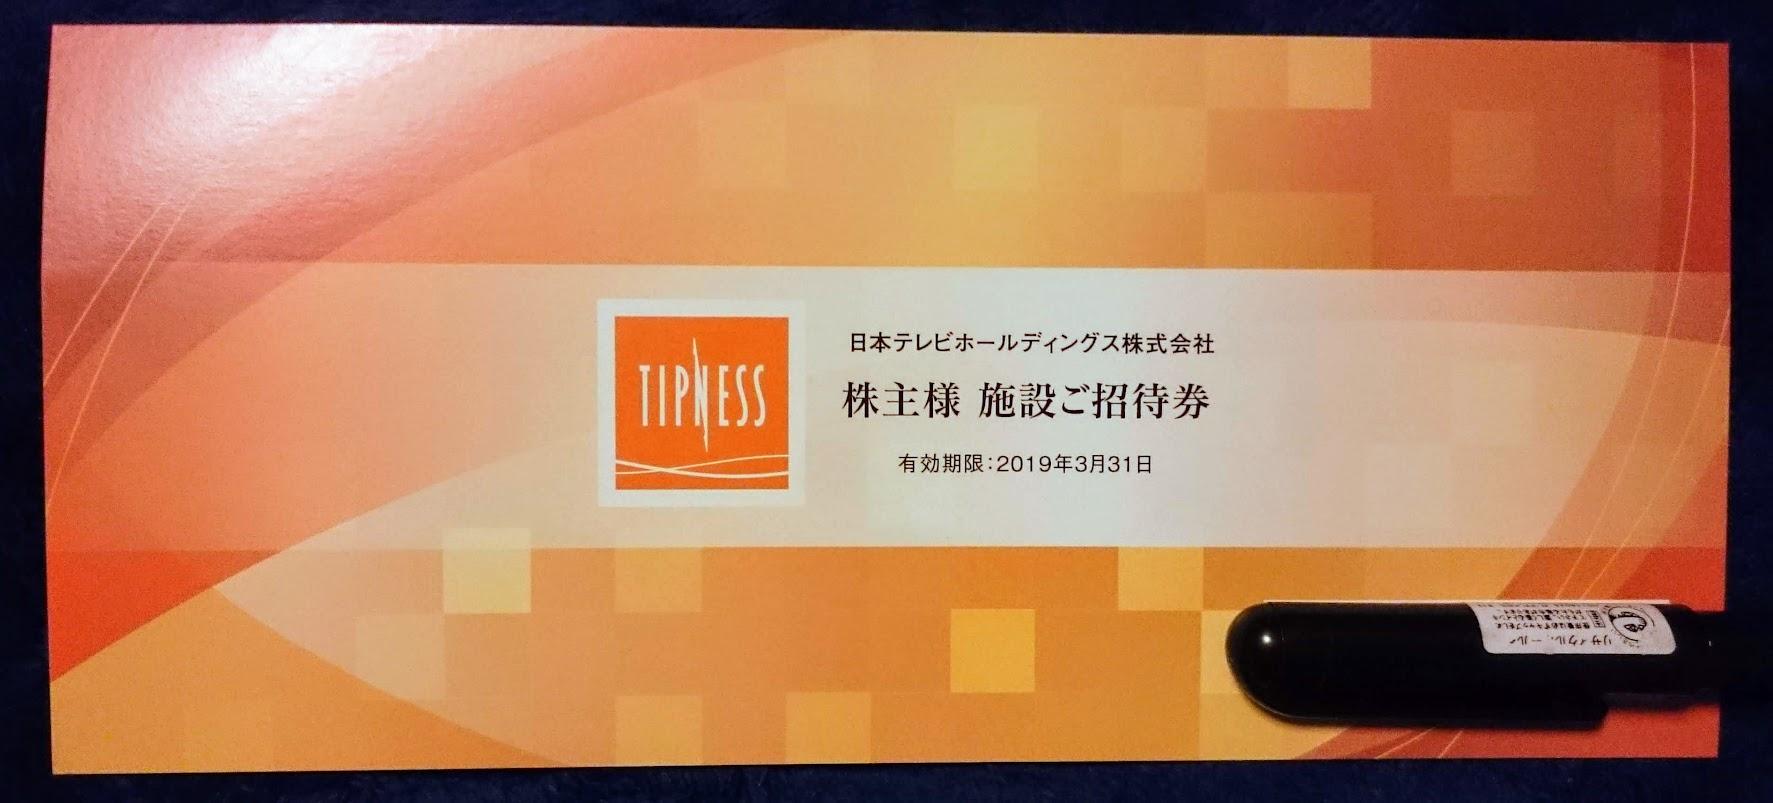 TIPNESS 株主様 施設ご招待券